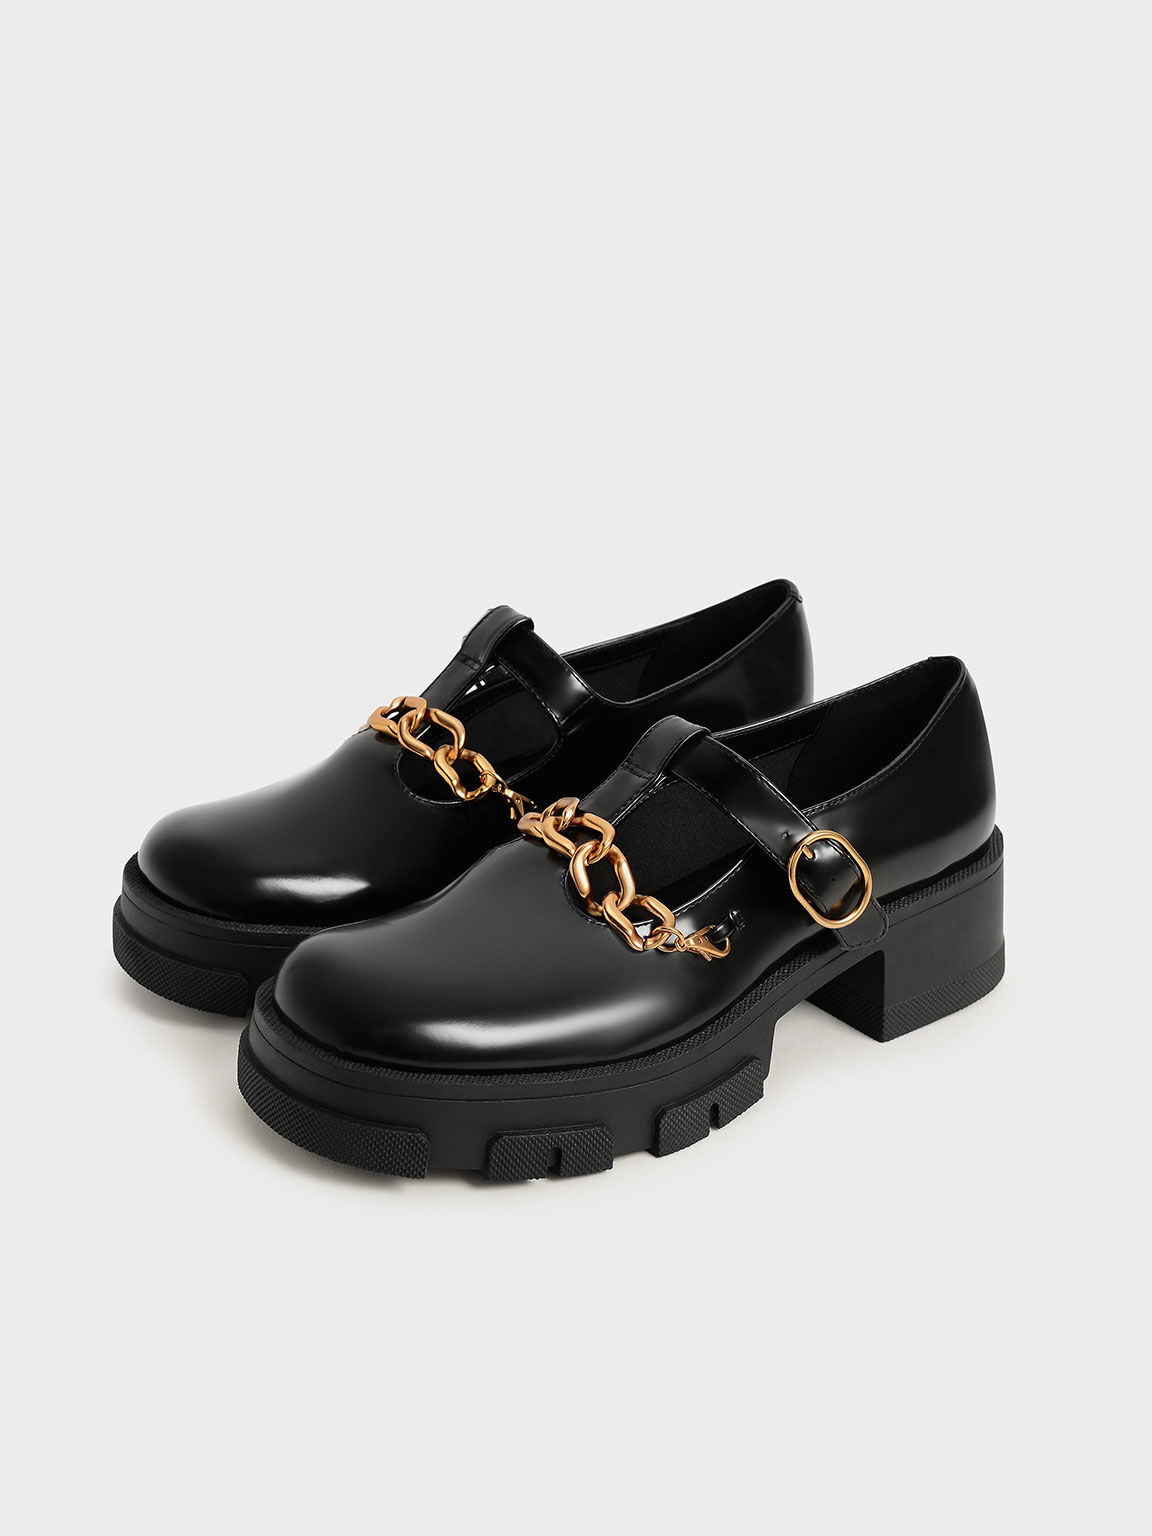 粗鍊厚底瑪莉珍鞋, 黑色, hi-res